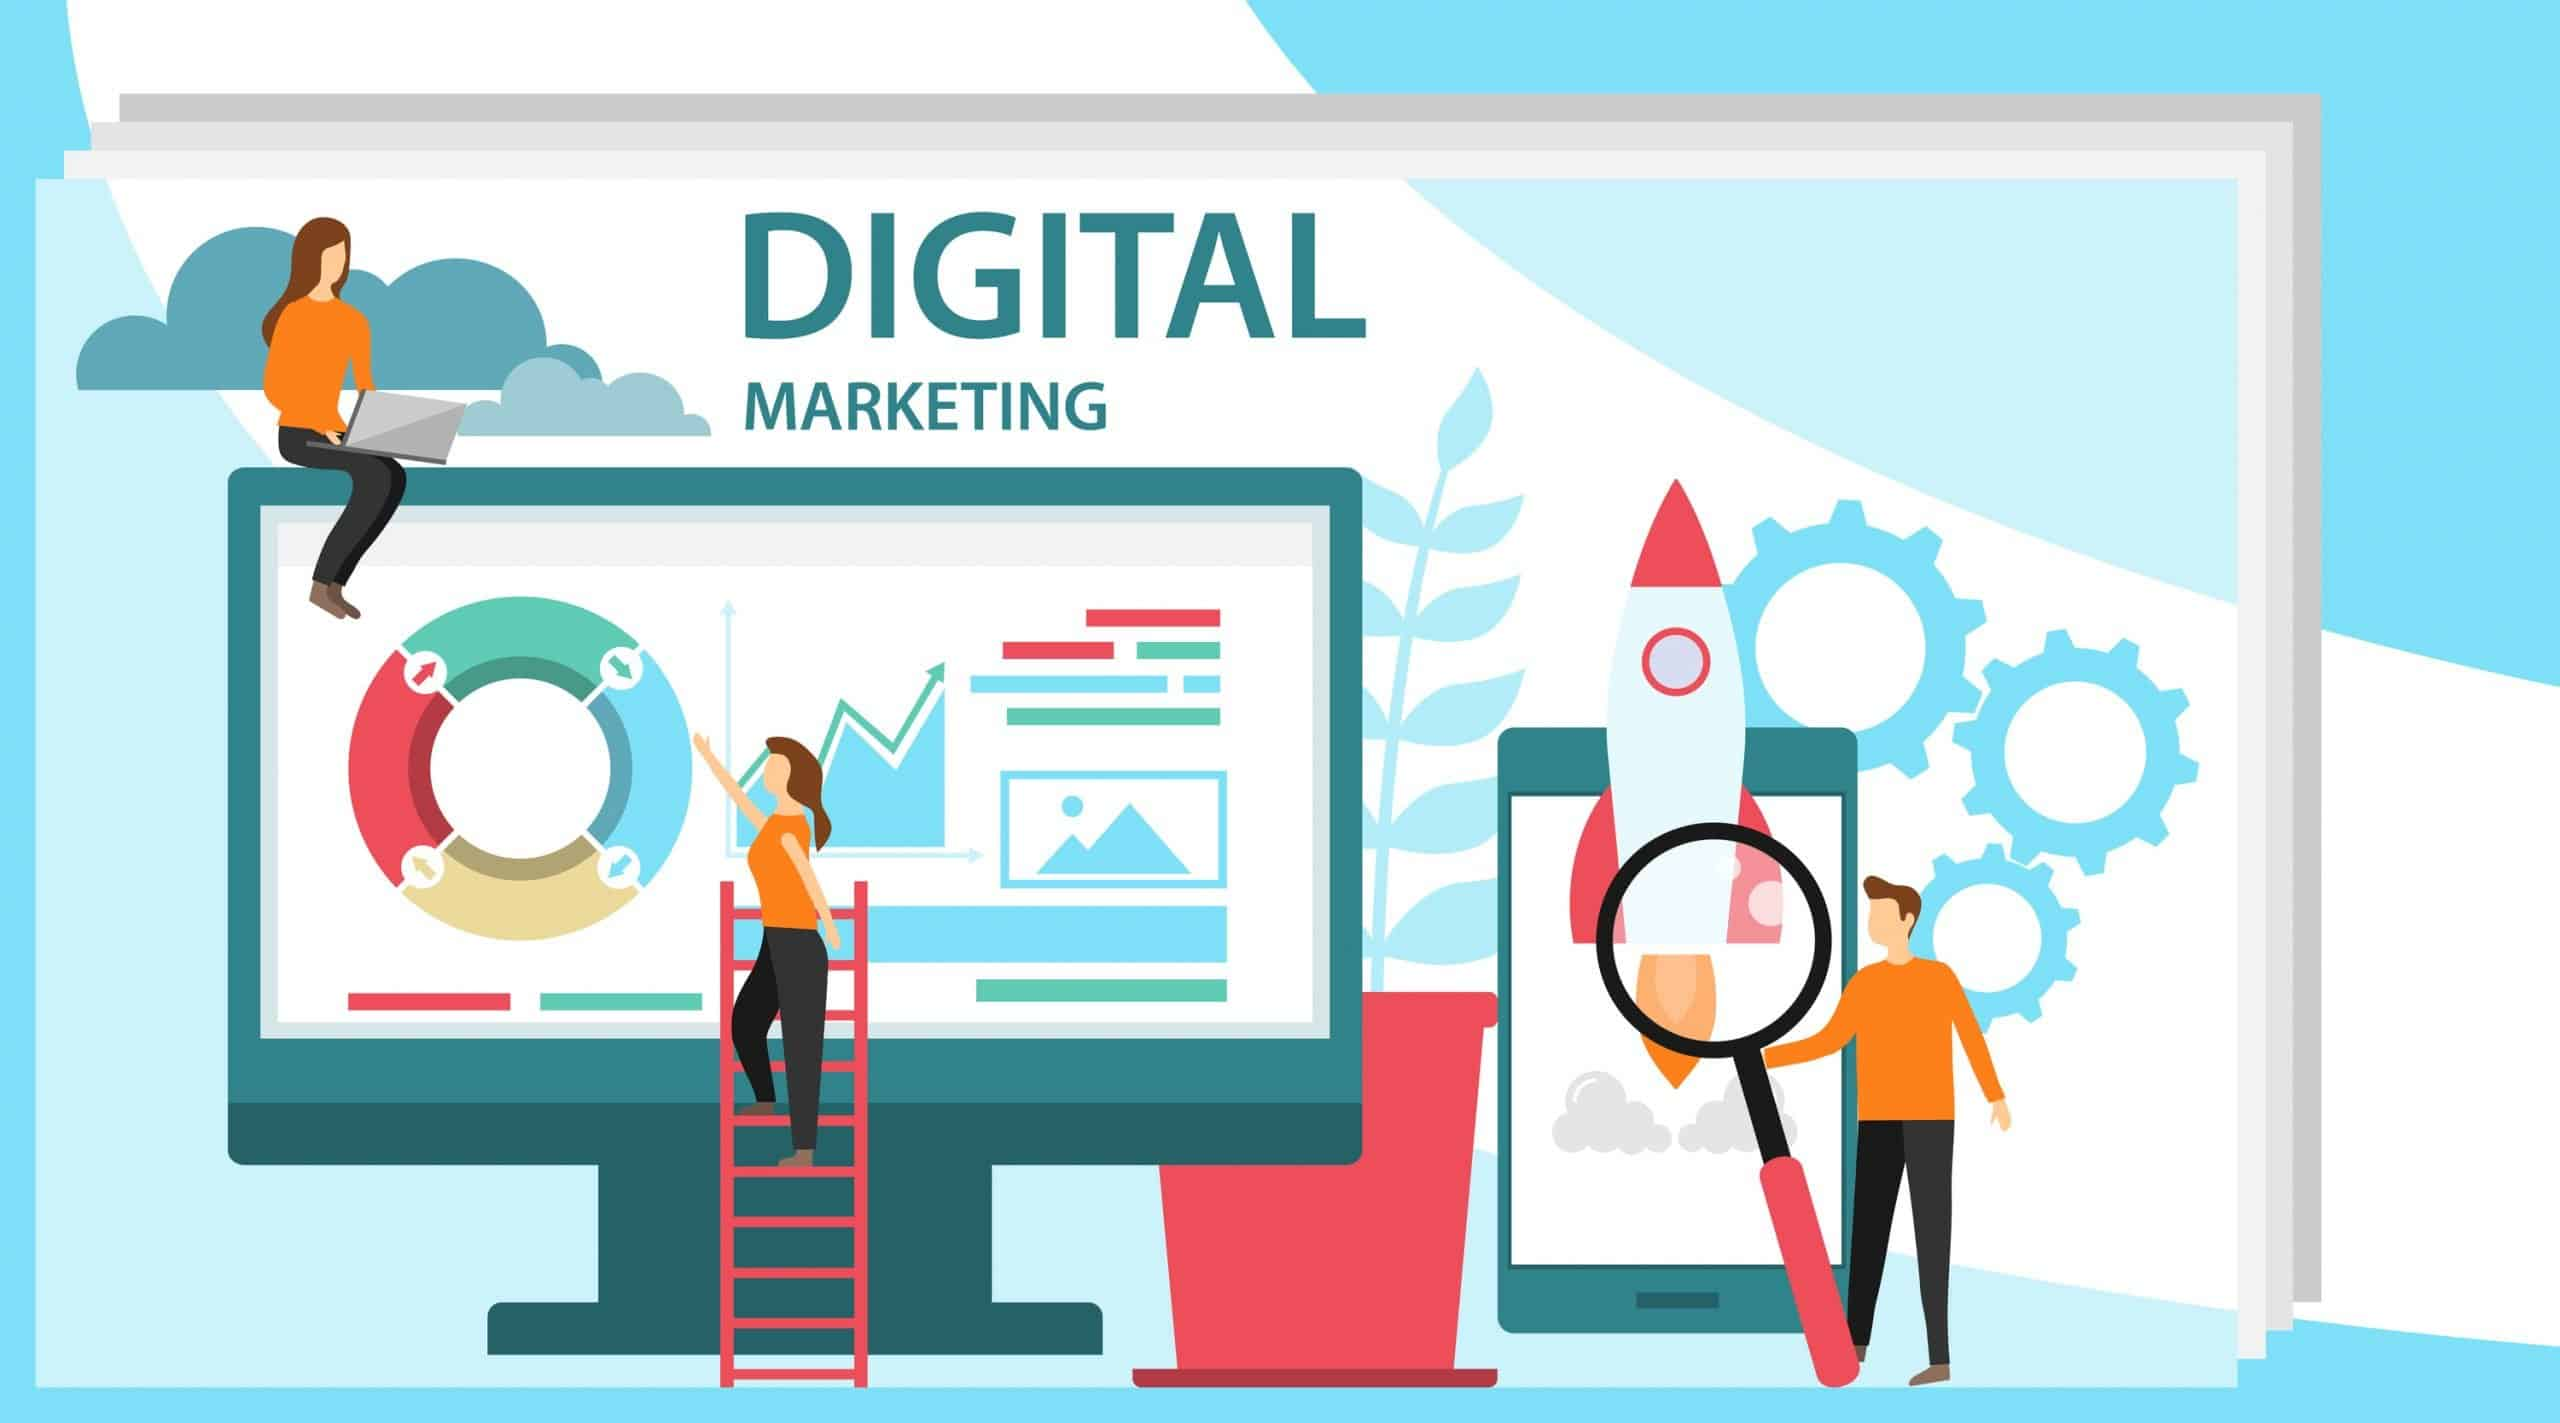 Increase Customer Engagement through digital marketing